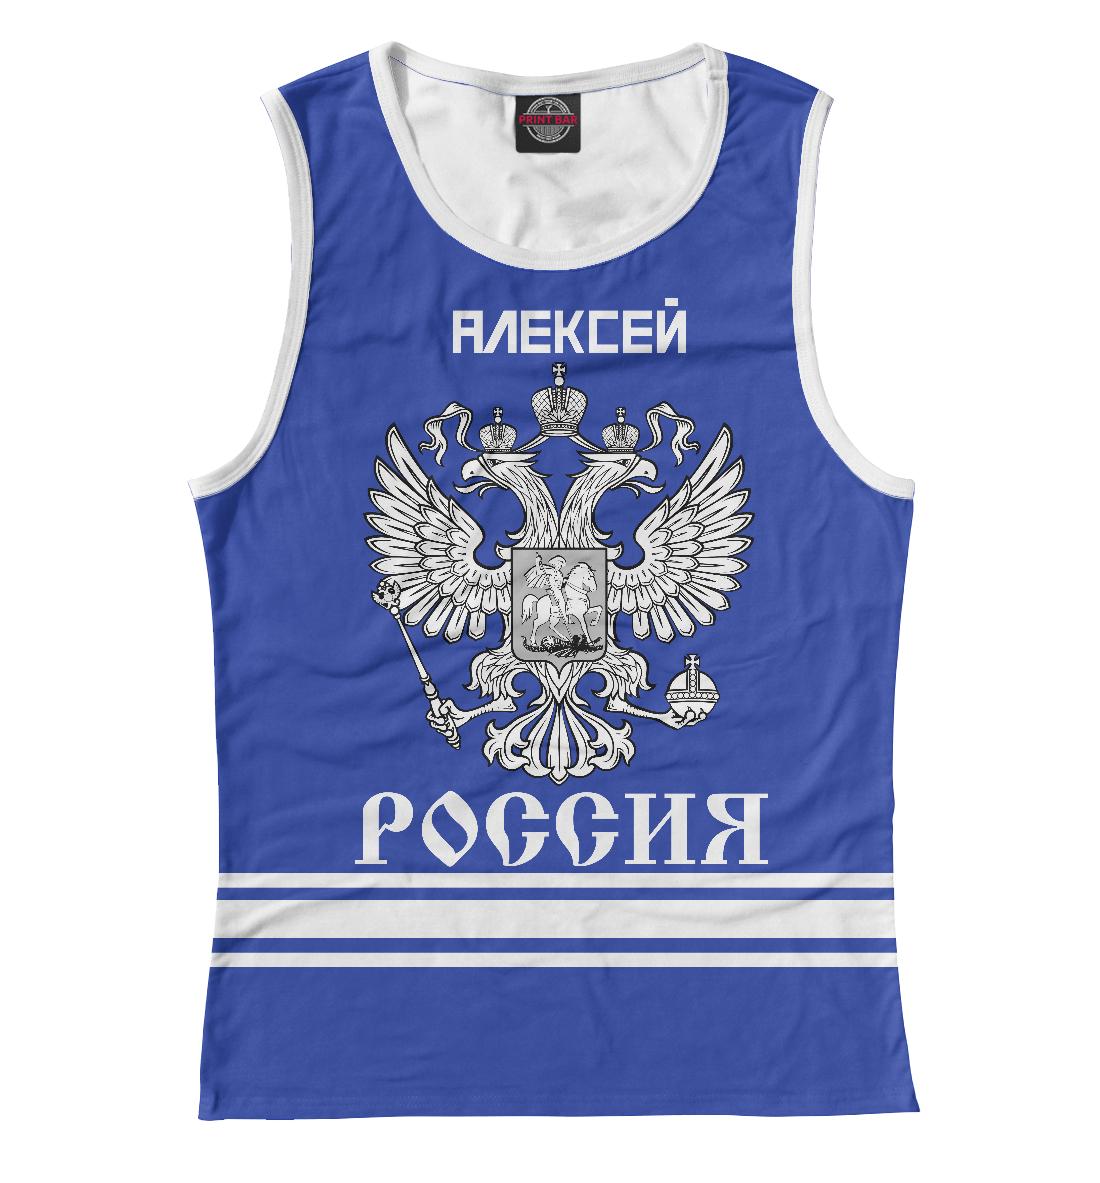 Купить АЛЕКСЕЙ sport russia collection, Printbar, Майки, ALE-271441-may-1